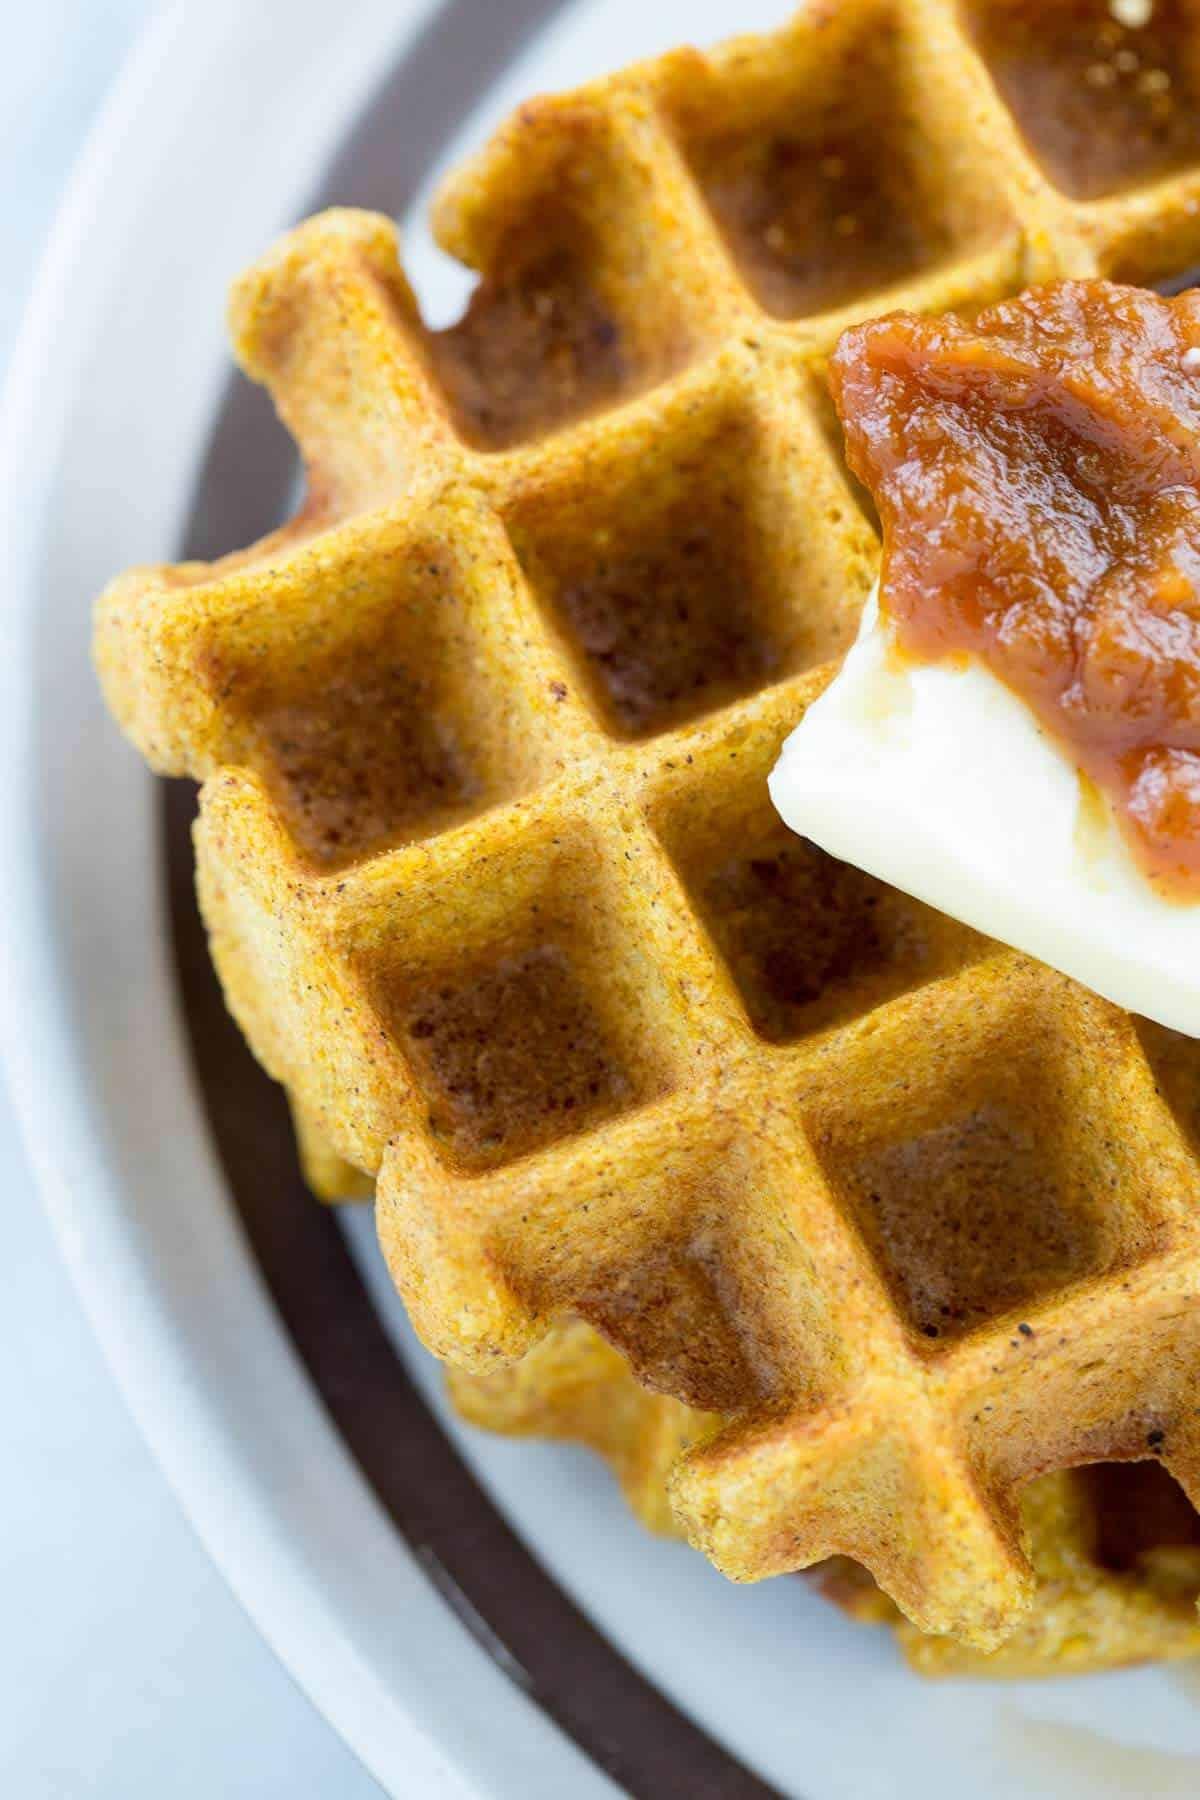 Buttermilk Pumpkin Spice Waffles - Fresh baked waffle with butter patty and pumpkin spread | jessicagavin.com